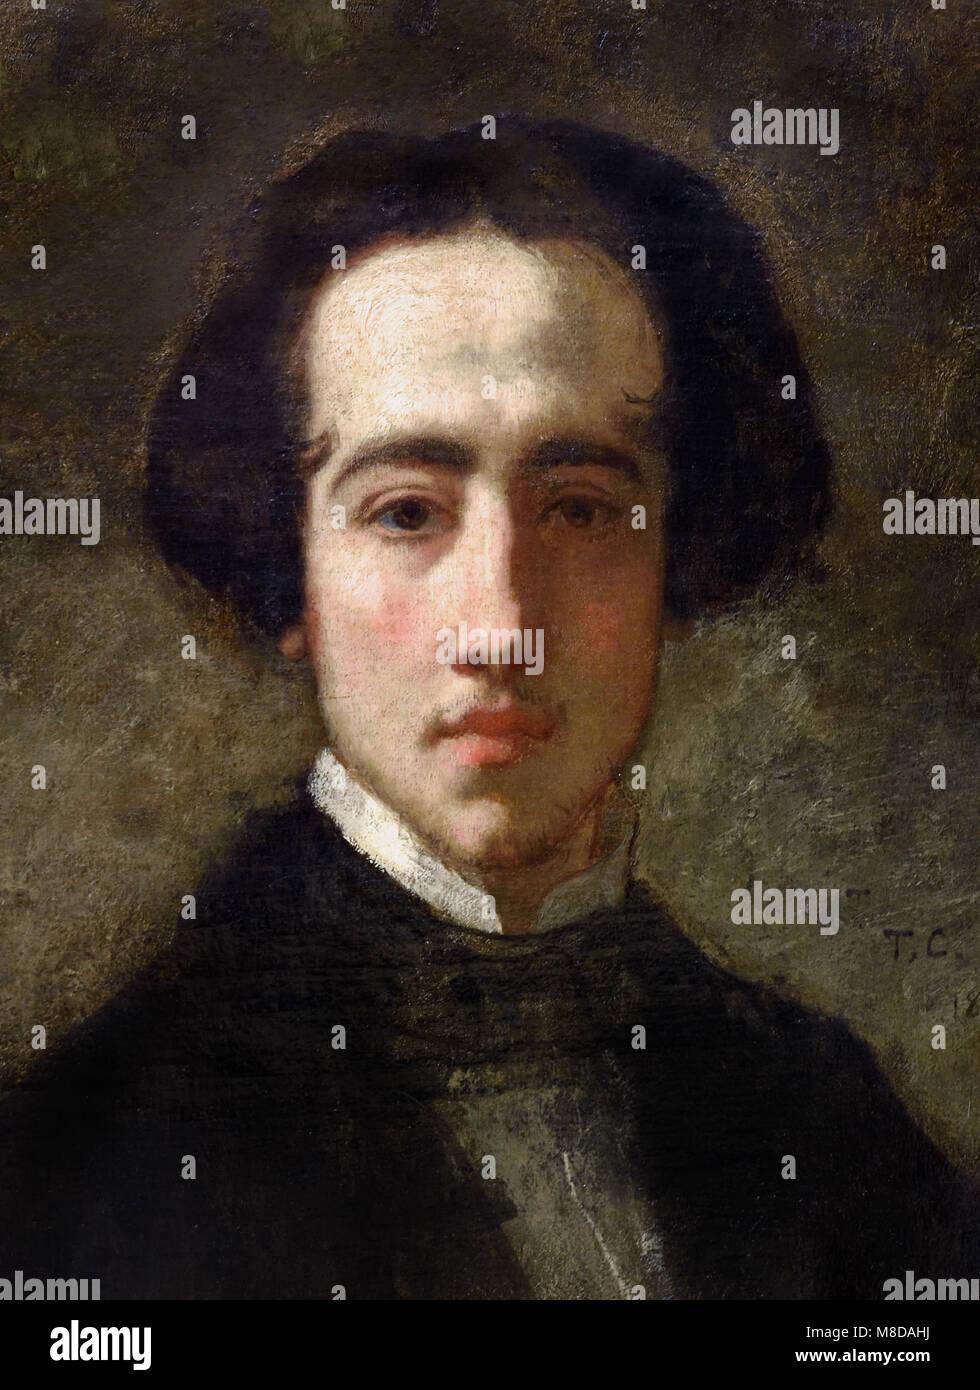 Prince Alonso (Espagne)1852 - 1815 Thomas Couture, France, 1879, Français Photo Stock